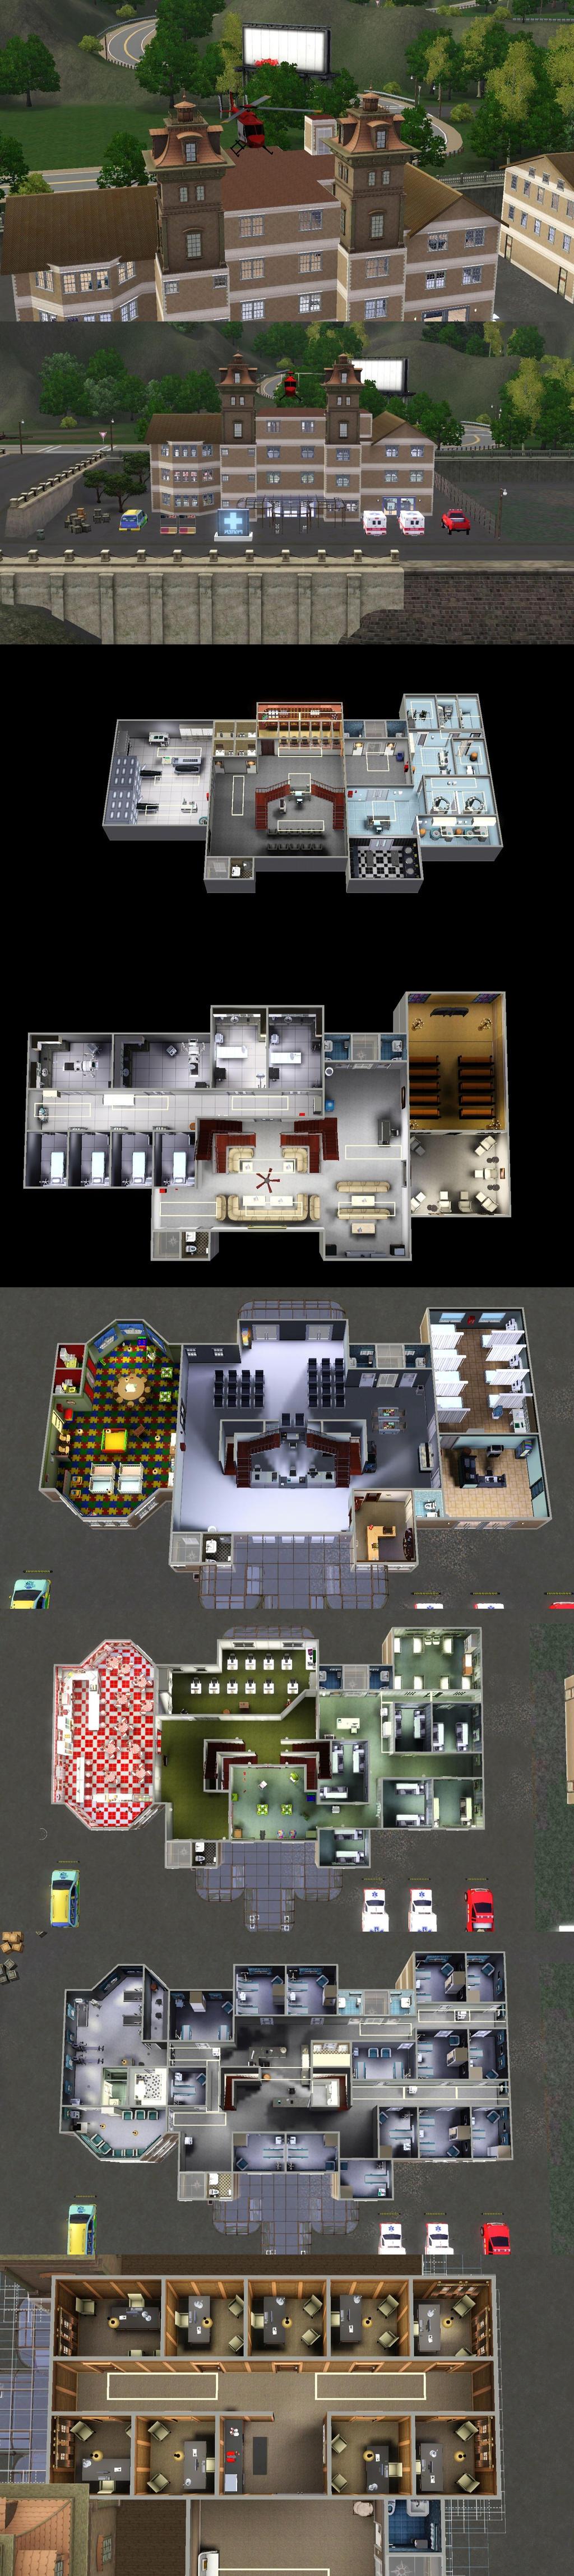 DESMC: Main Hospital